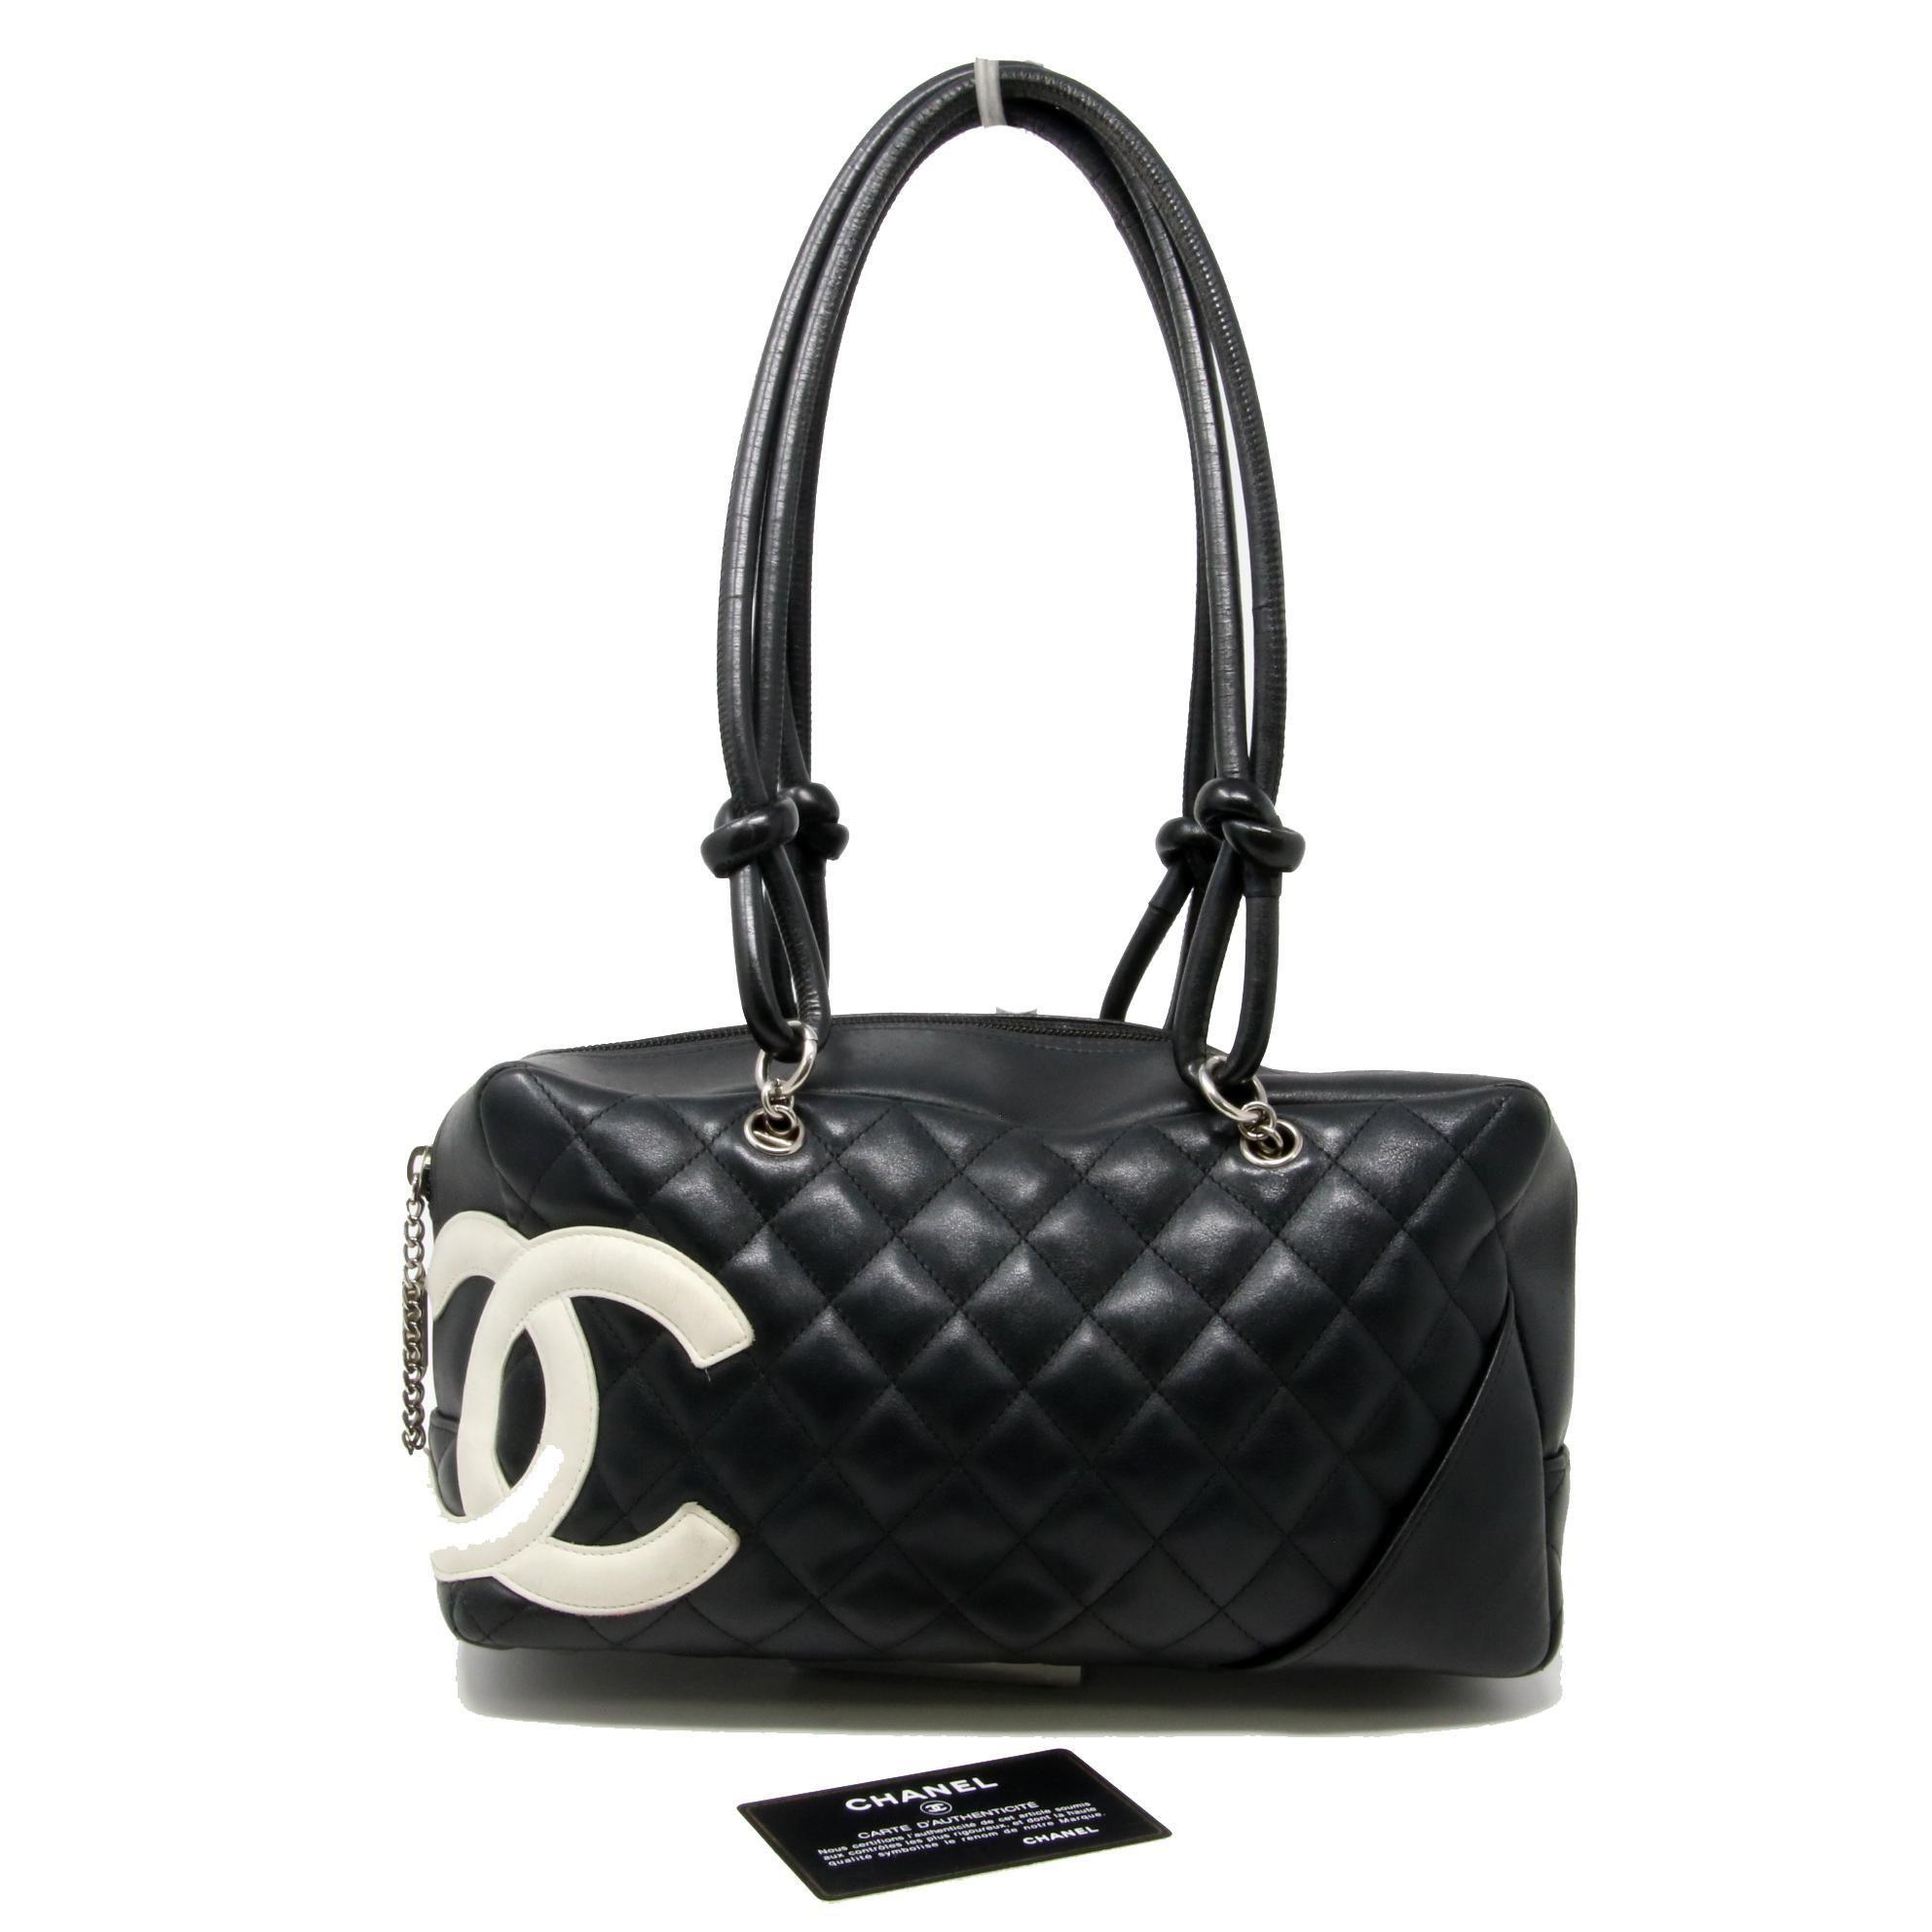 0509837f491c79 Chanel Cambon Classic Cc Diamond Quilted Ligne Mini Bowling Black Calfskin  Leather #lv #louboutin #losangeles #luxurylife #birkin #luxurybag #givenchy  ...